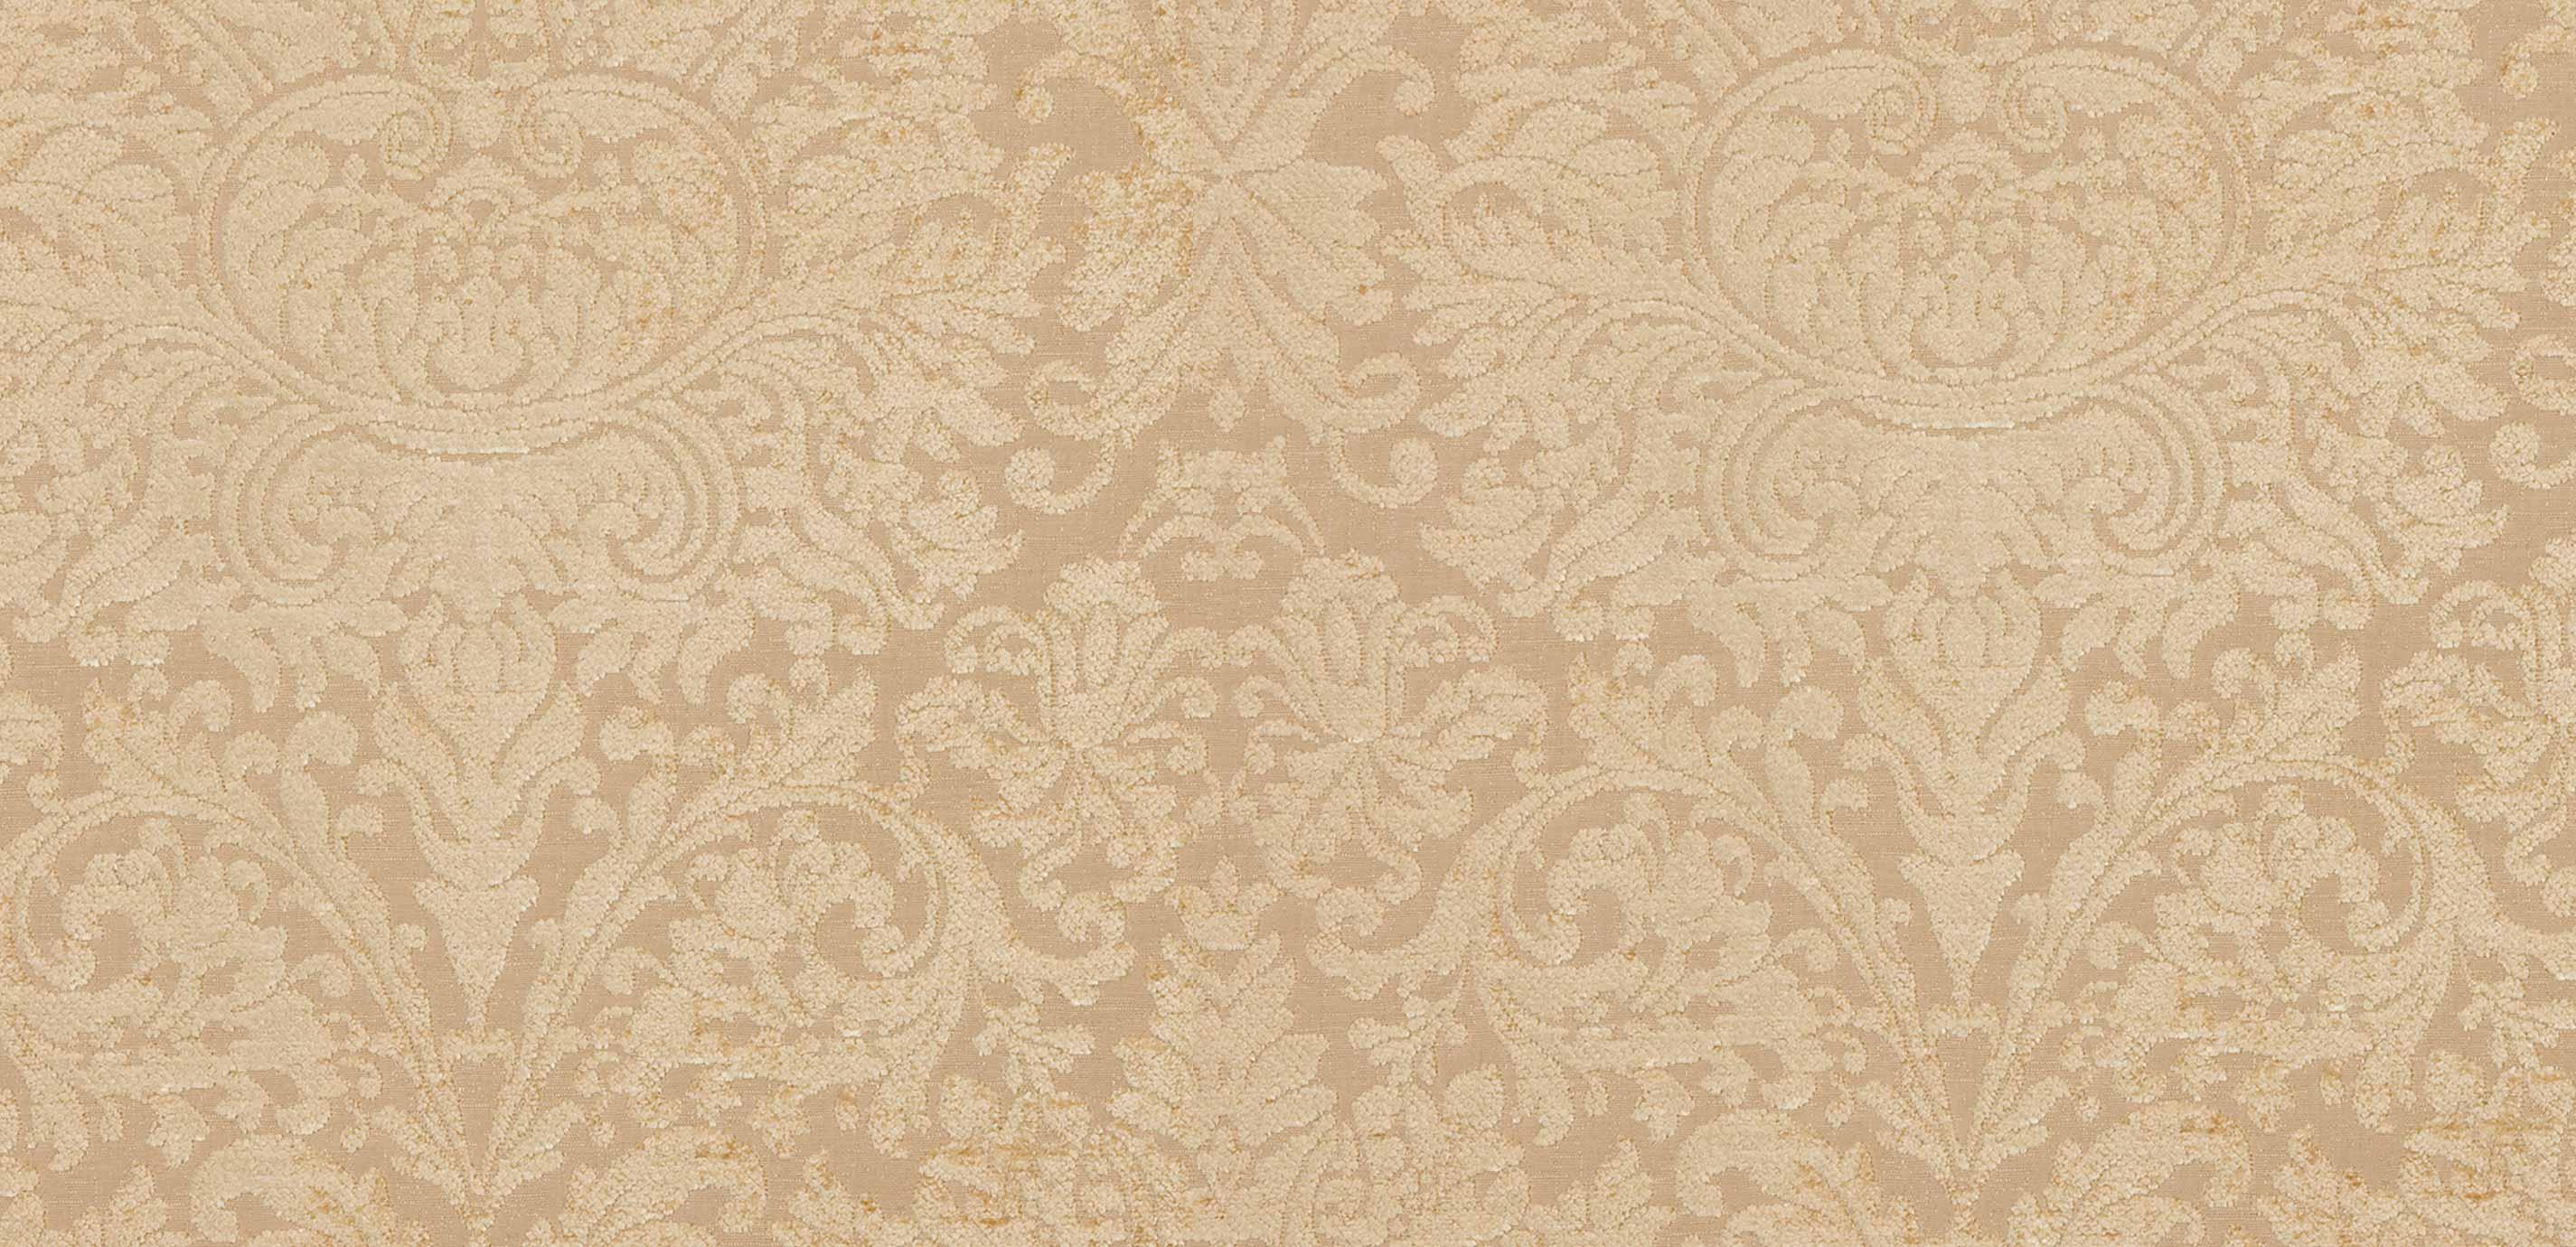 Haven Champagne Fabric Fabrics Ethan Allen